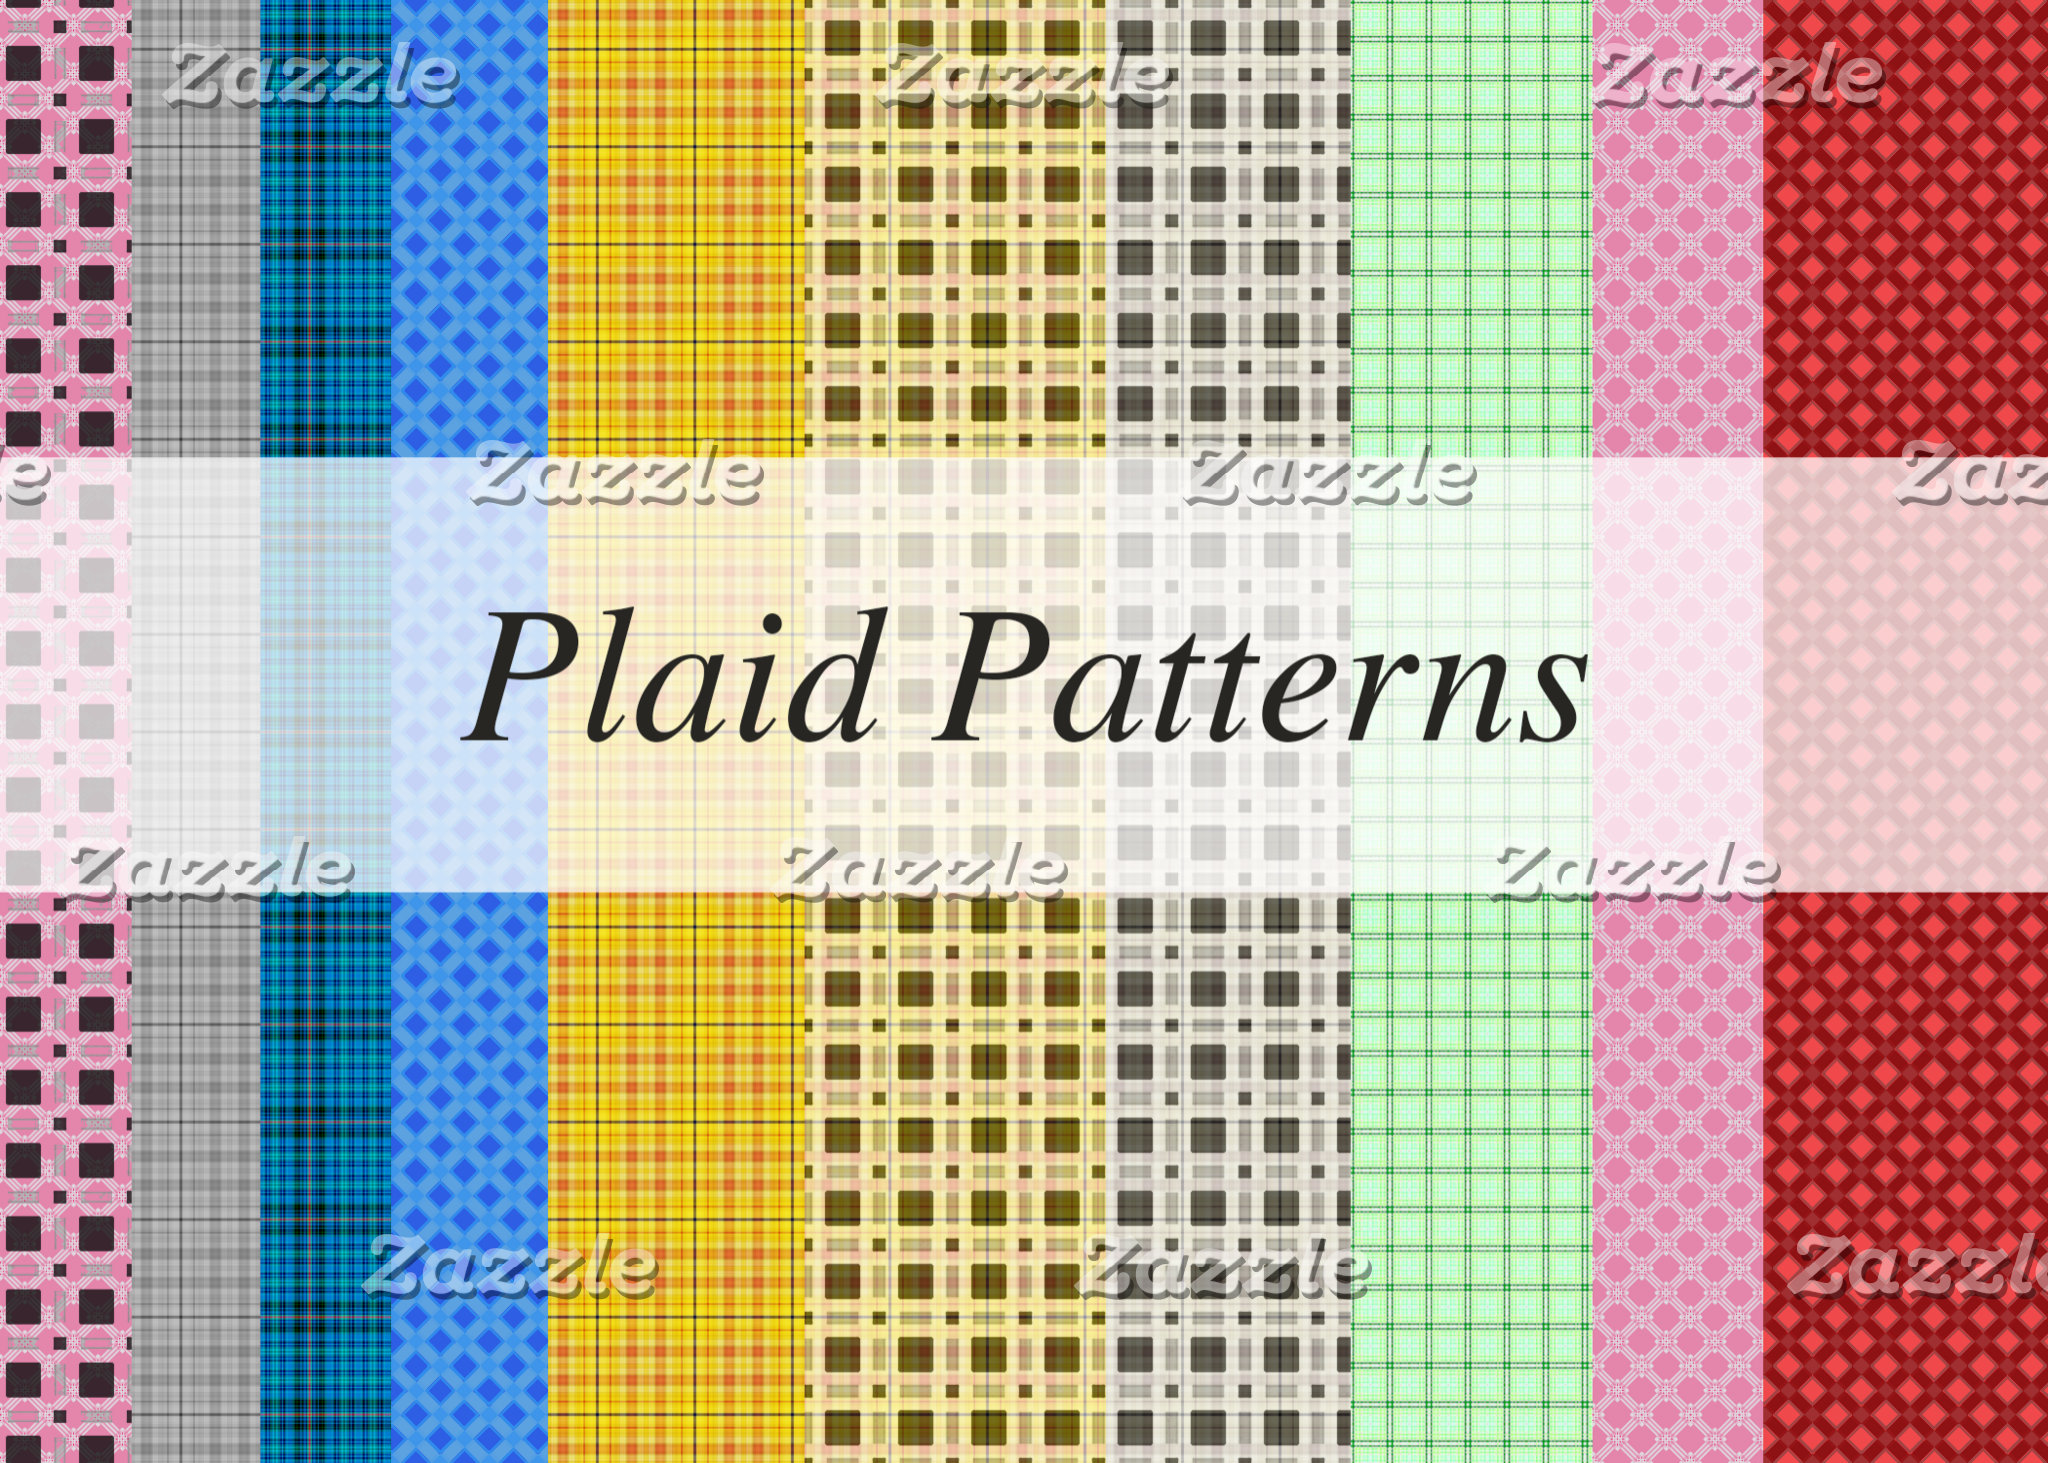 Plaid Patterns